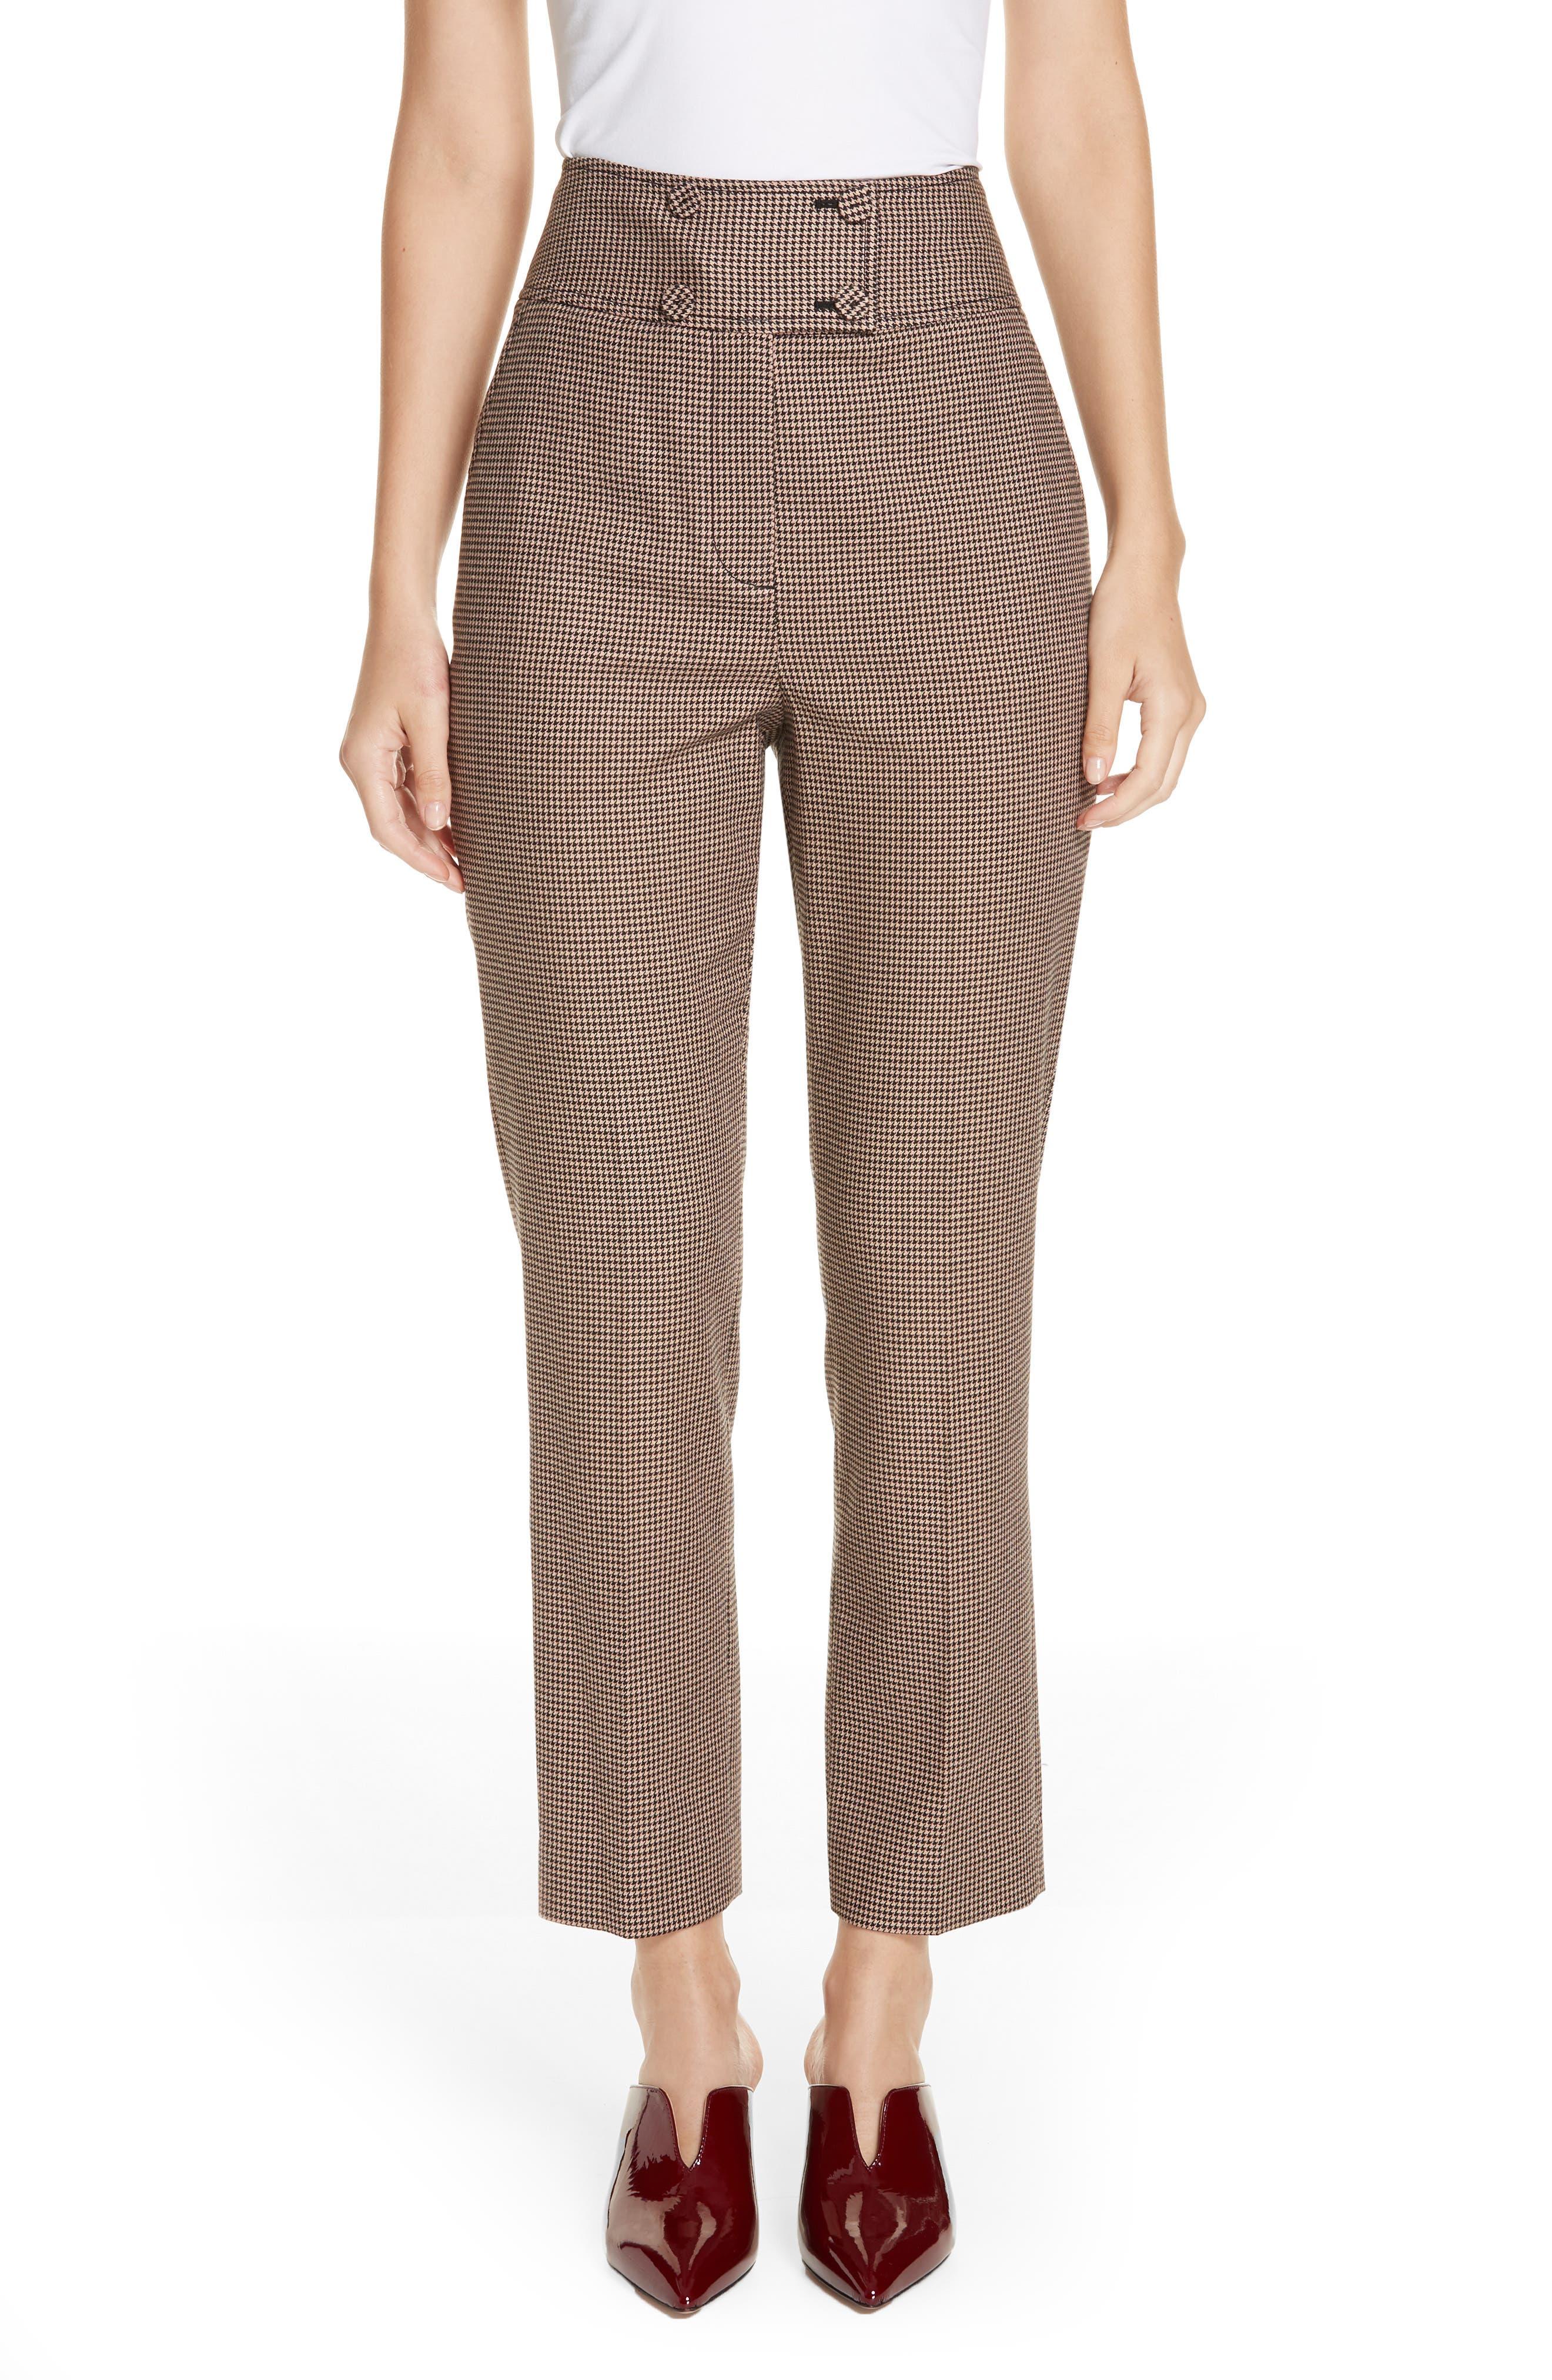 Houndstooth Check Stretch Cotton Blend Pants,                             Main thumbnail 1, color,                             CAMEL/ BLACK